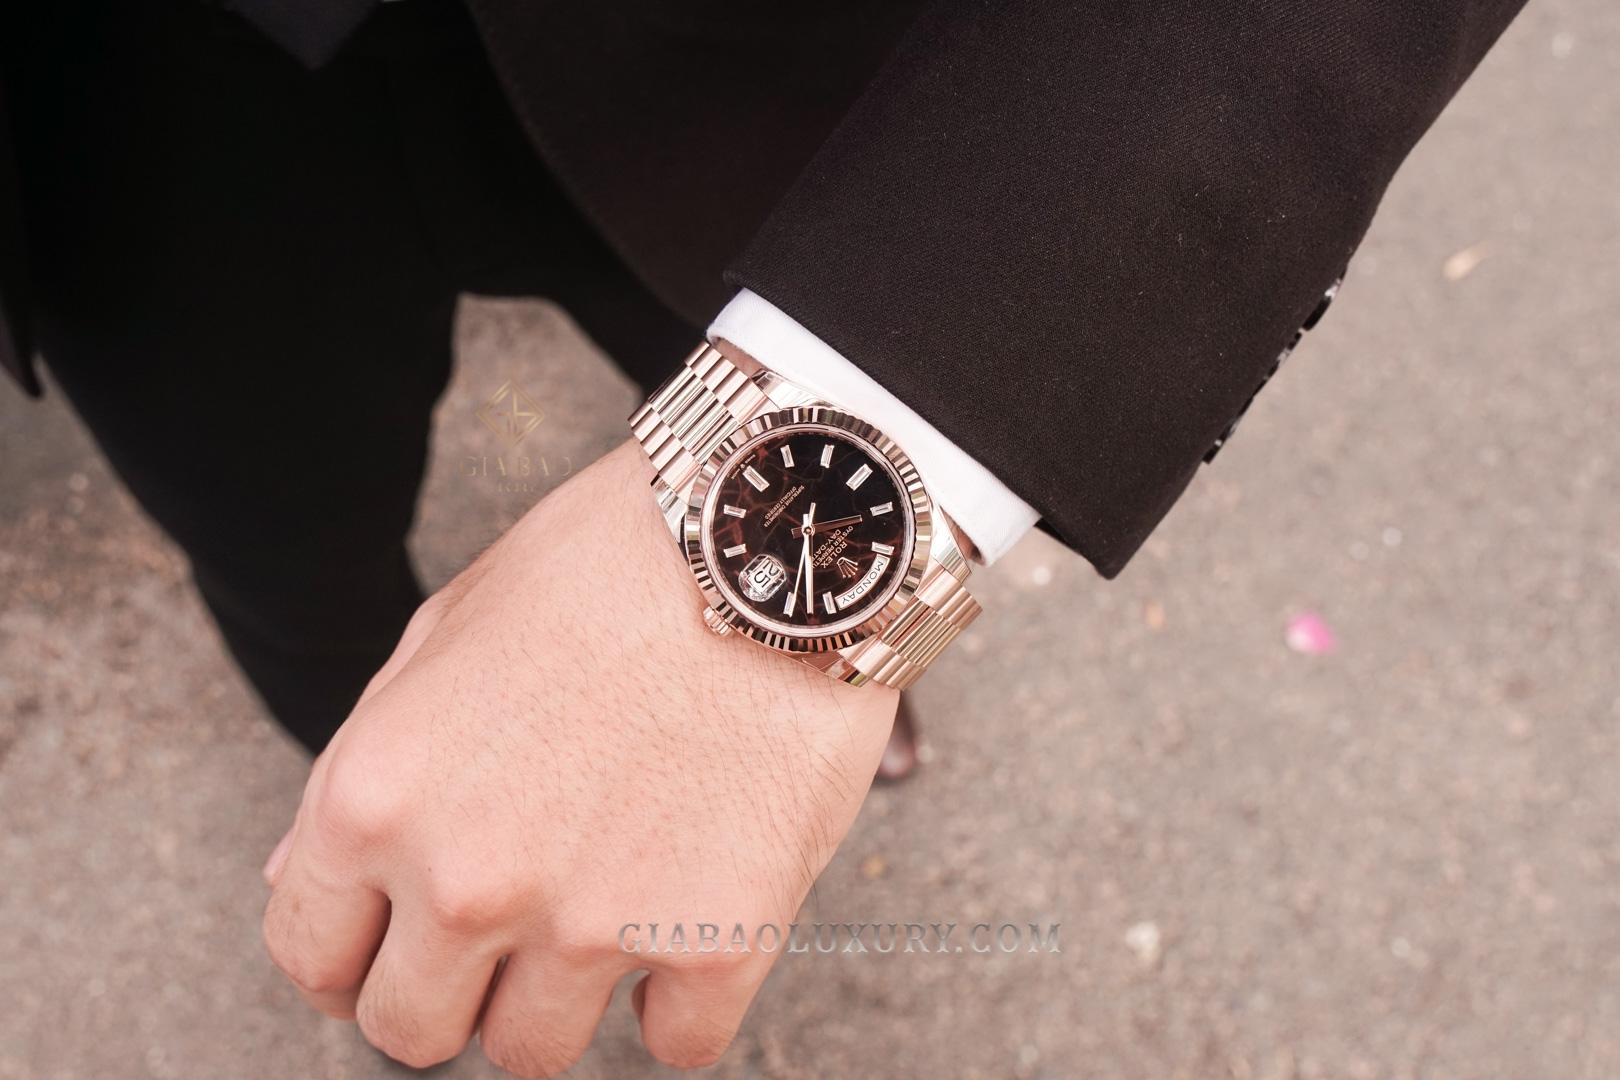 Cận cảnh đồng hồ Rolex Day-Date 40 228235 Mặt Số Eisenkiesel (New Model 2021)